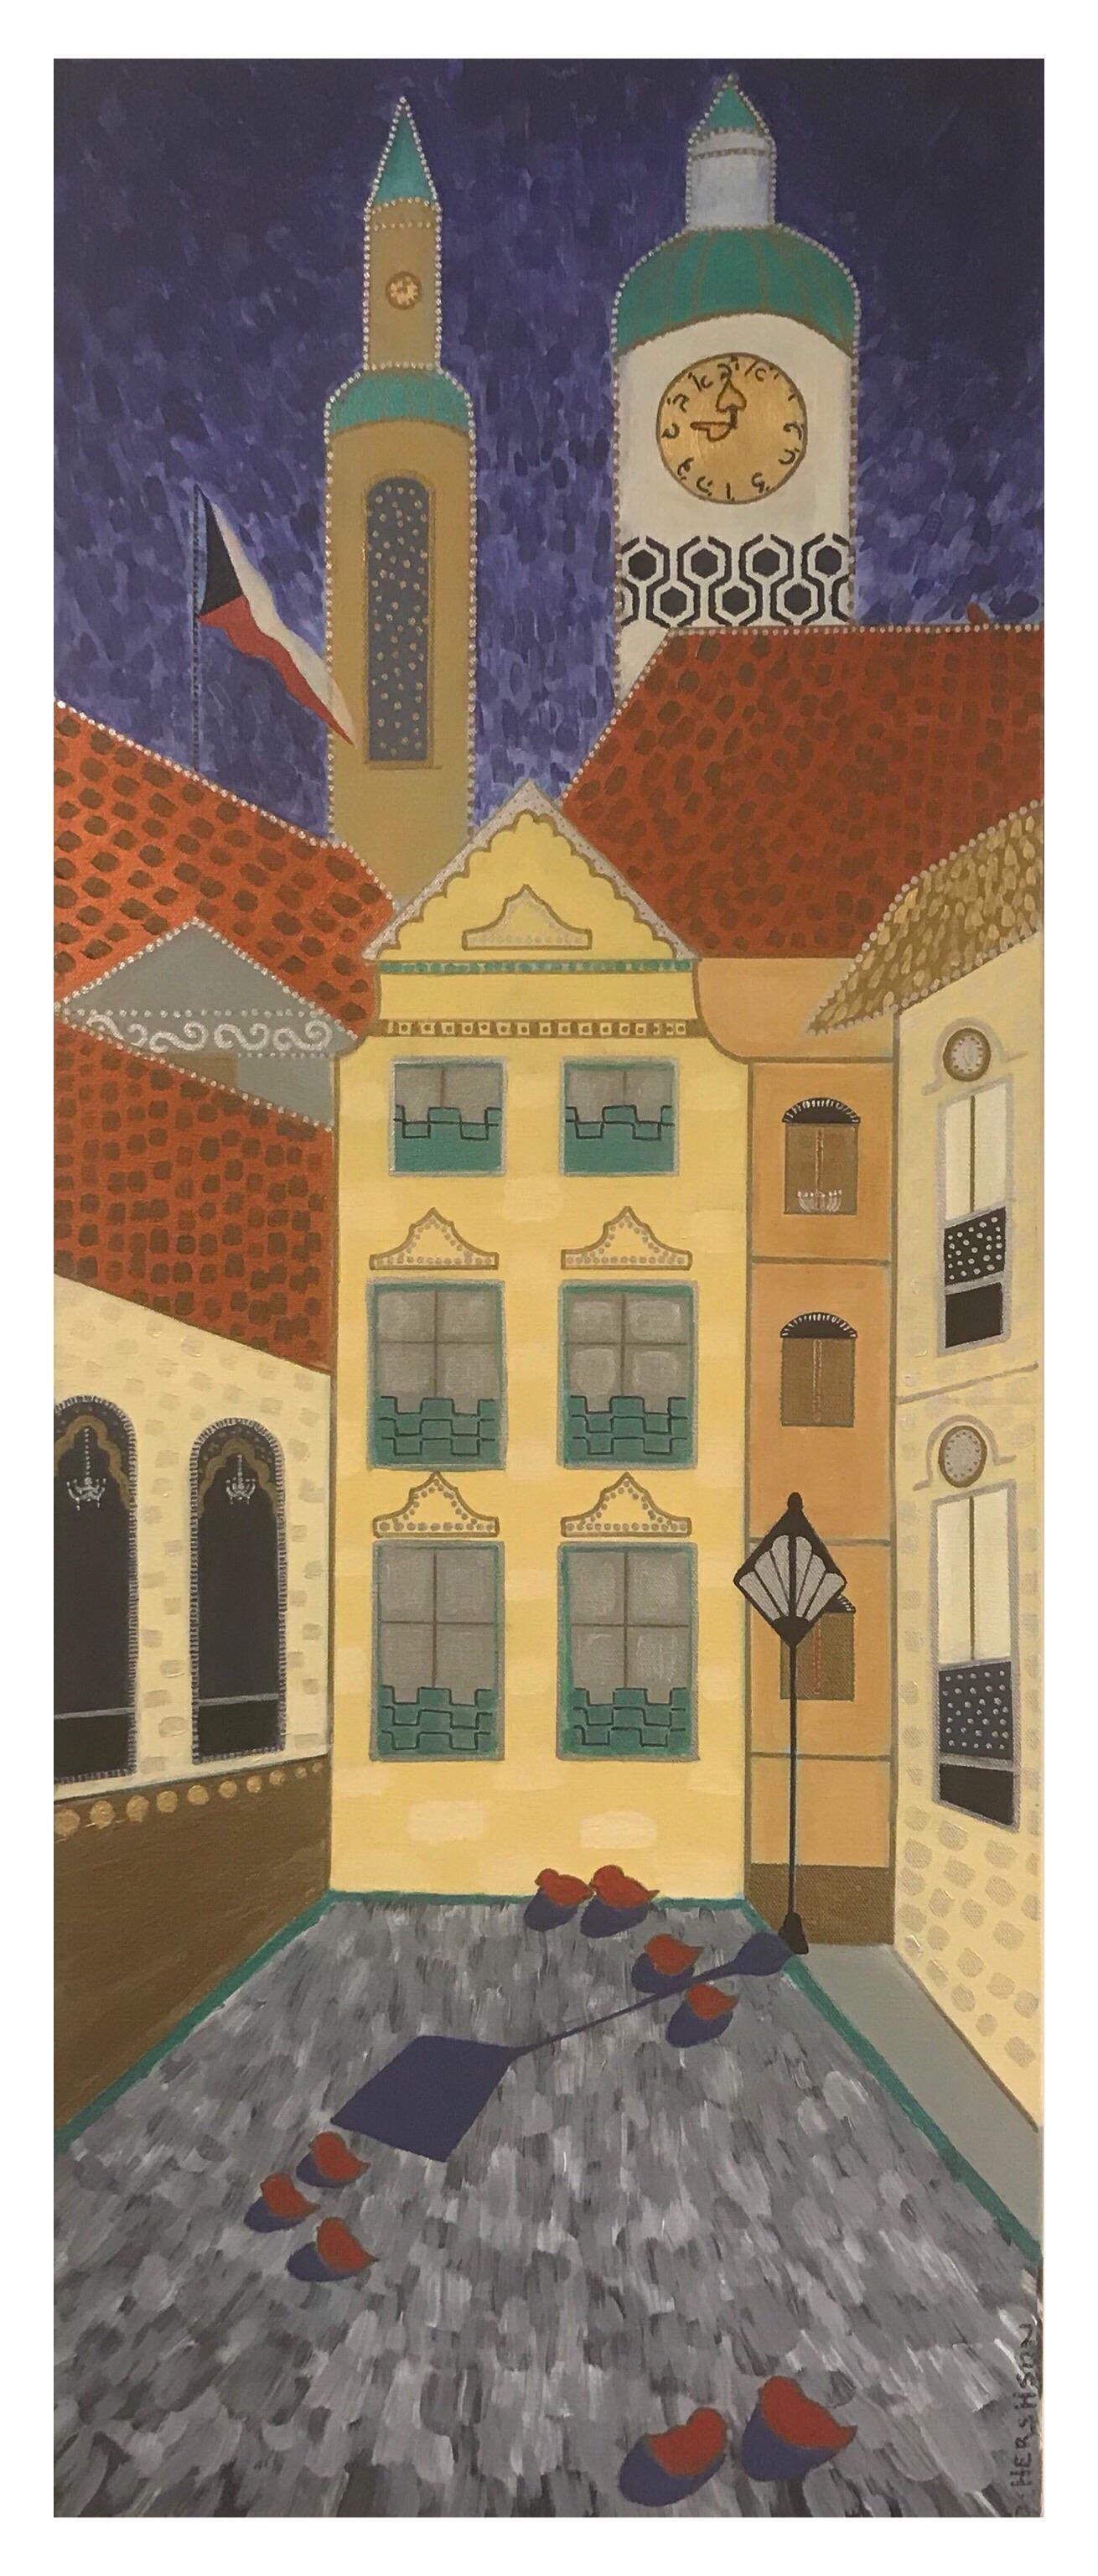 The Golem City 12 x 36